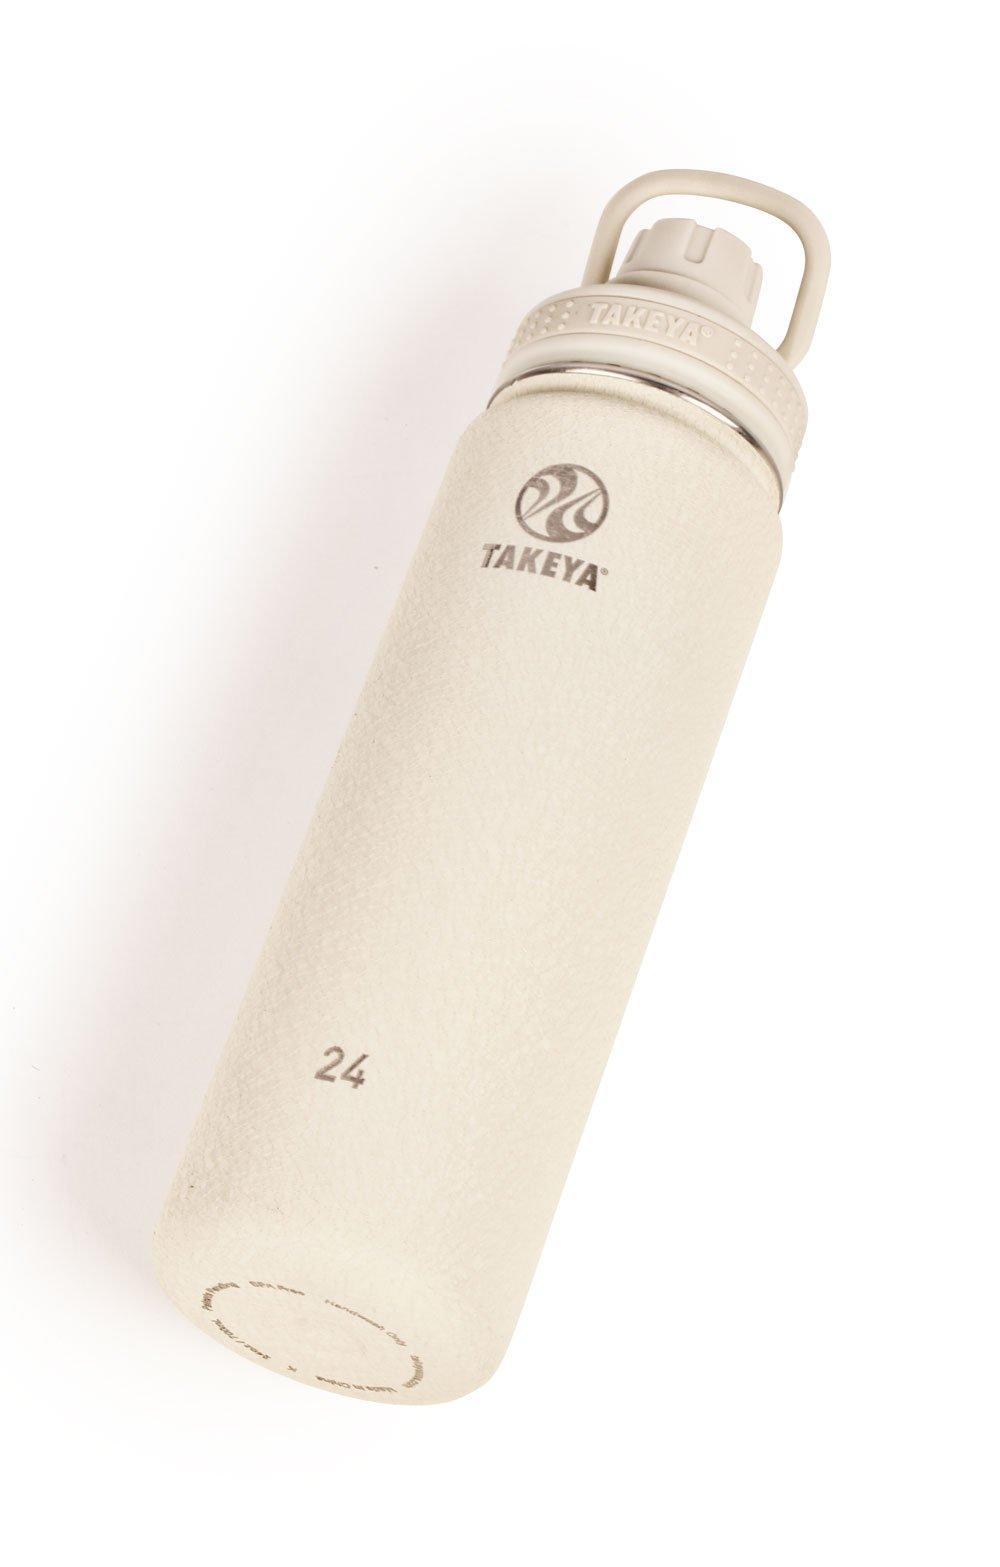 Takeya 24-ounce Originals Insulated Water Bottle